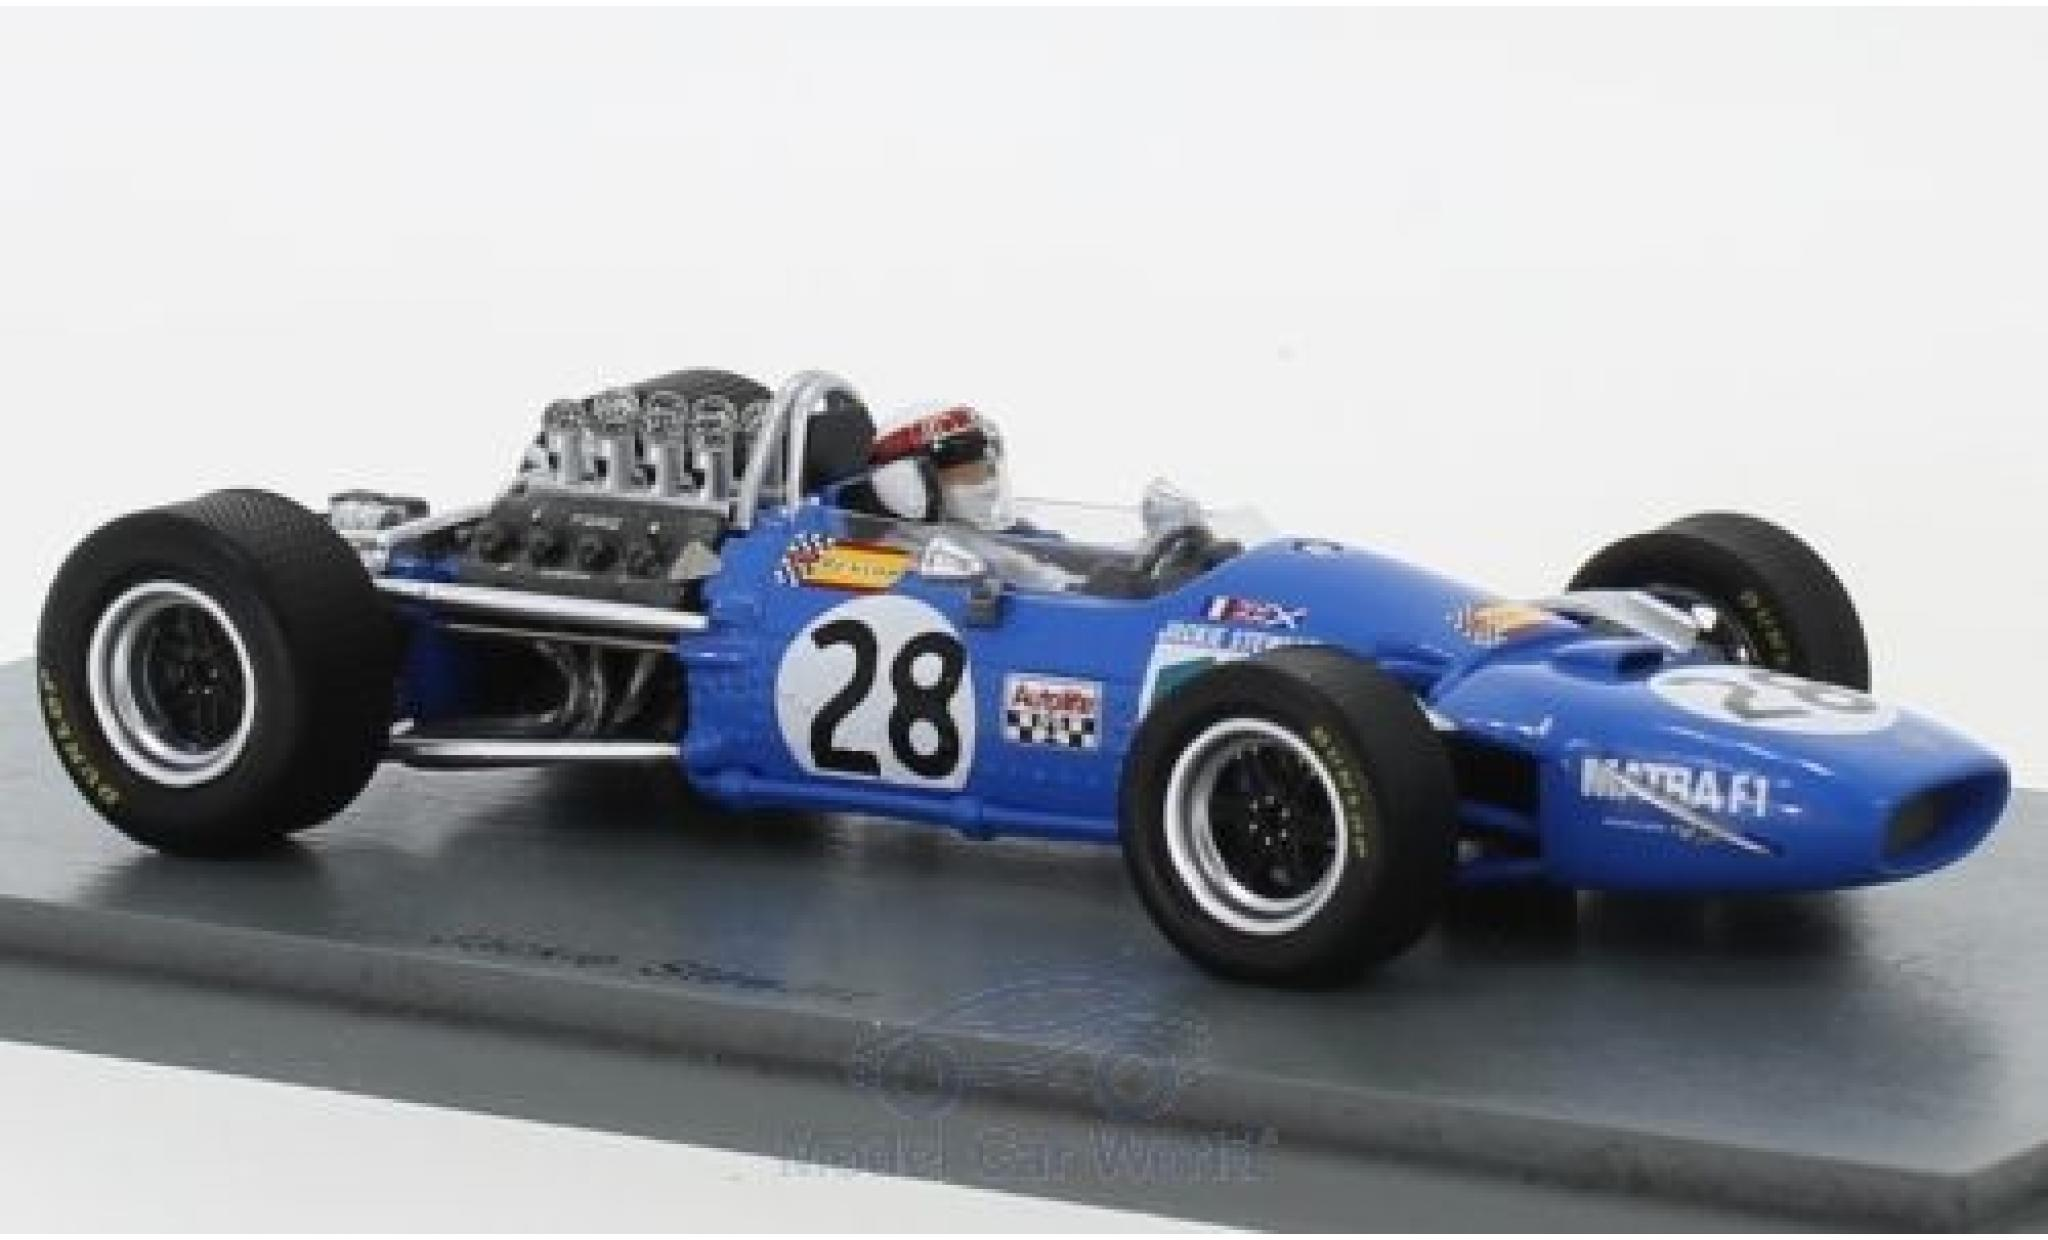 Matra MS1 1/43 Spark 0 No.28 Formel 1 GP Frankreich 1968 J.Stewart